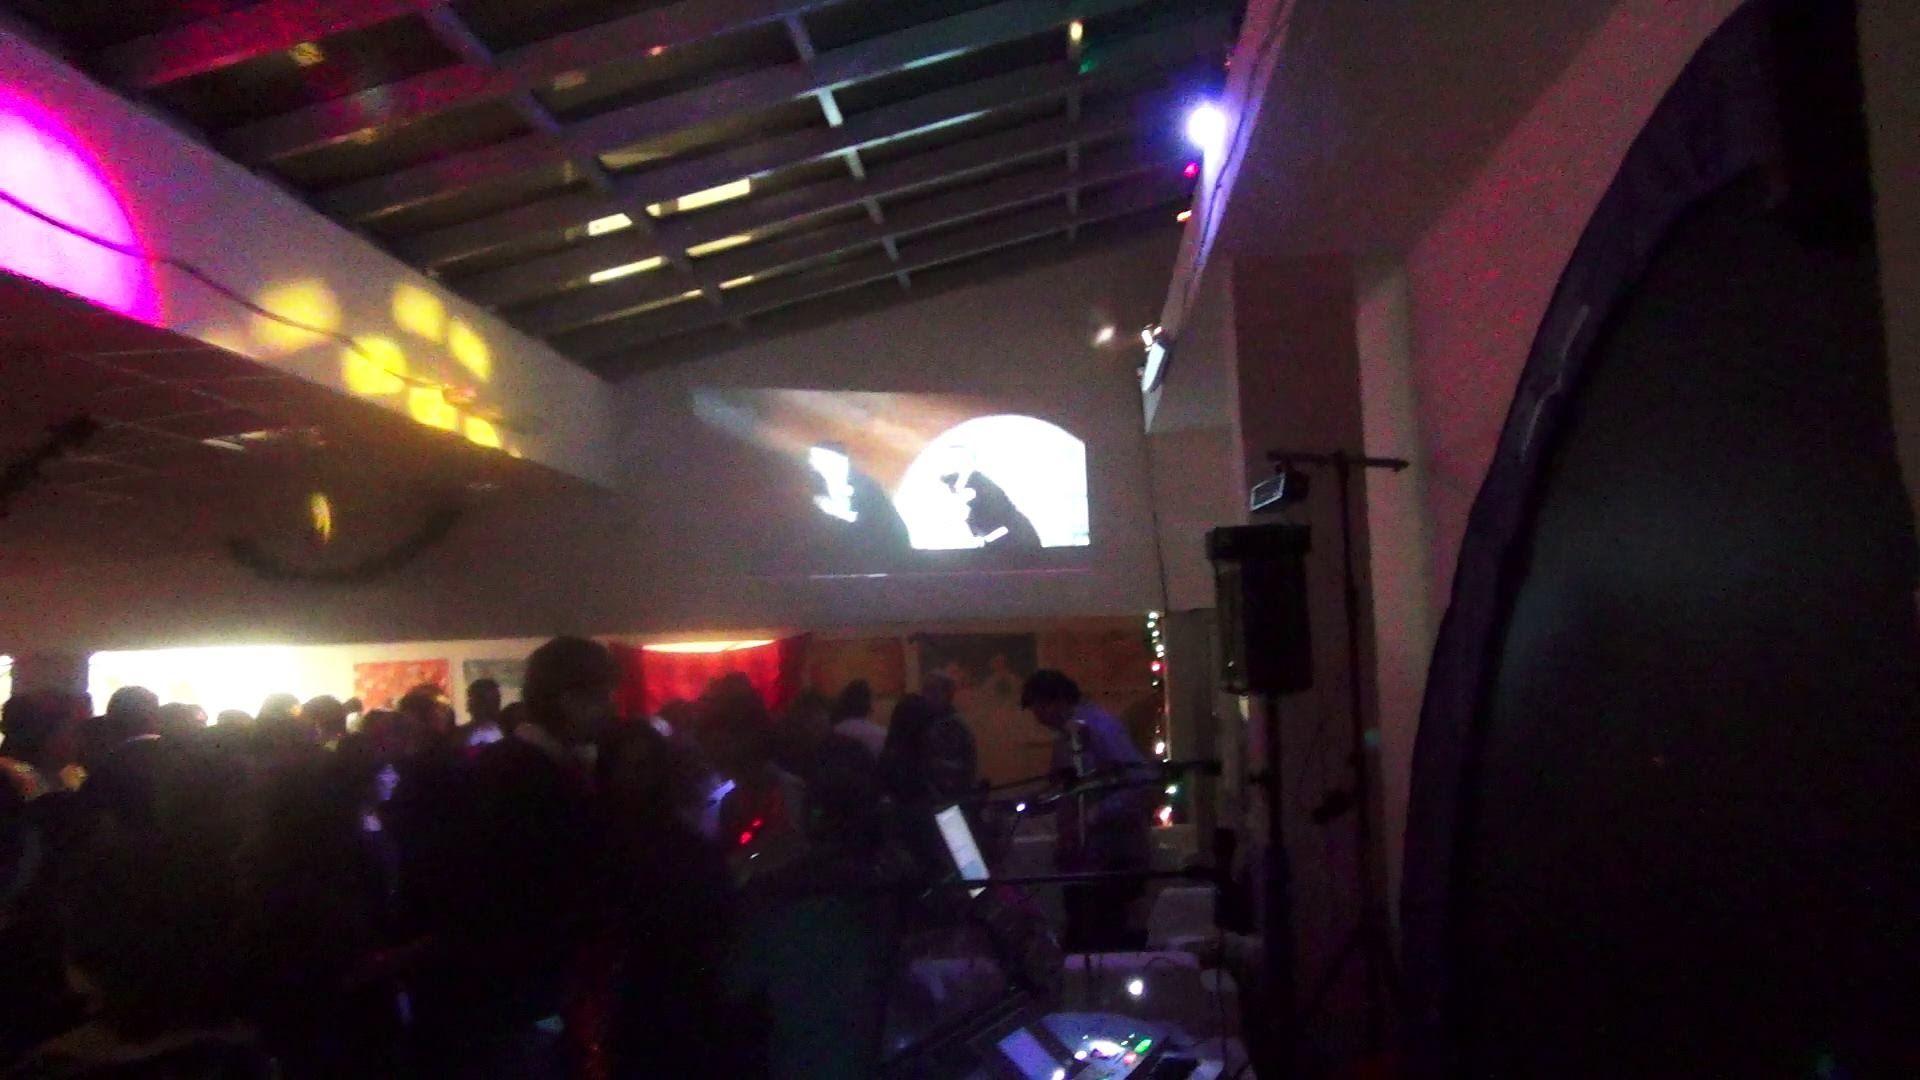 Ary Roby Balada Boa Para para pere pere Capodanno 2014 Mufe Party a Trieste